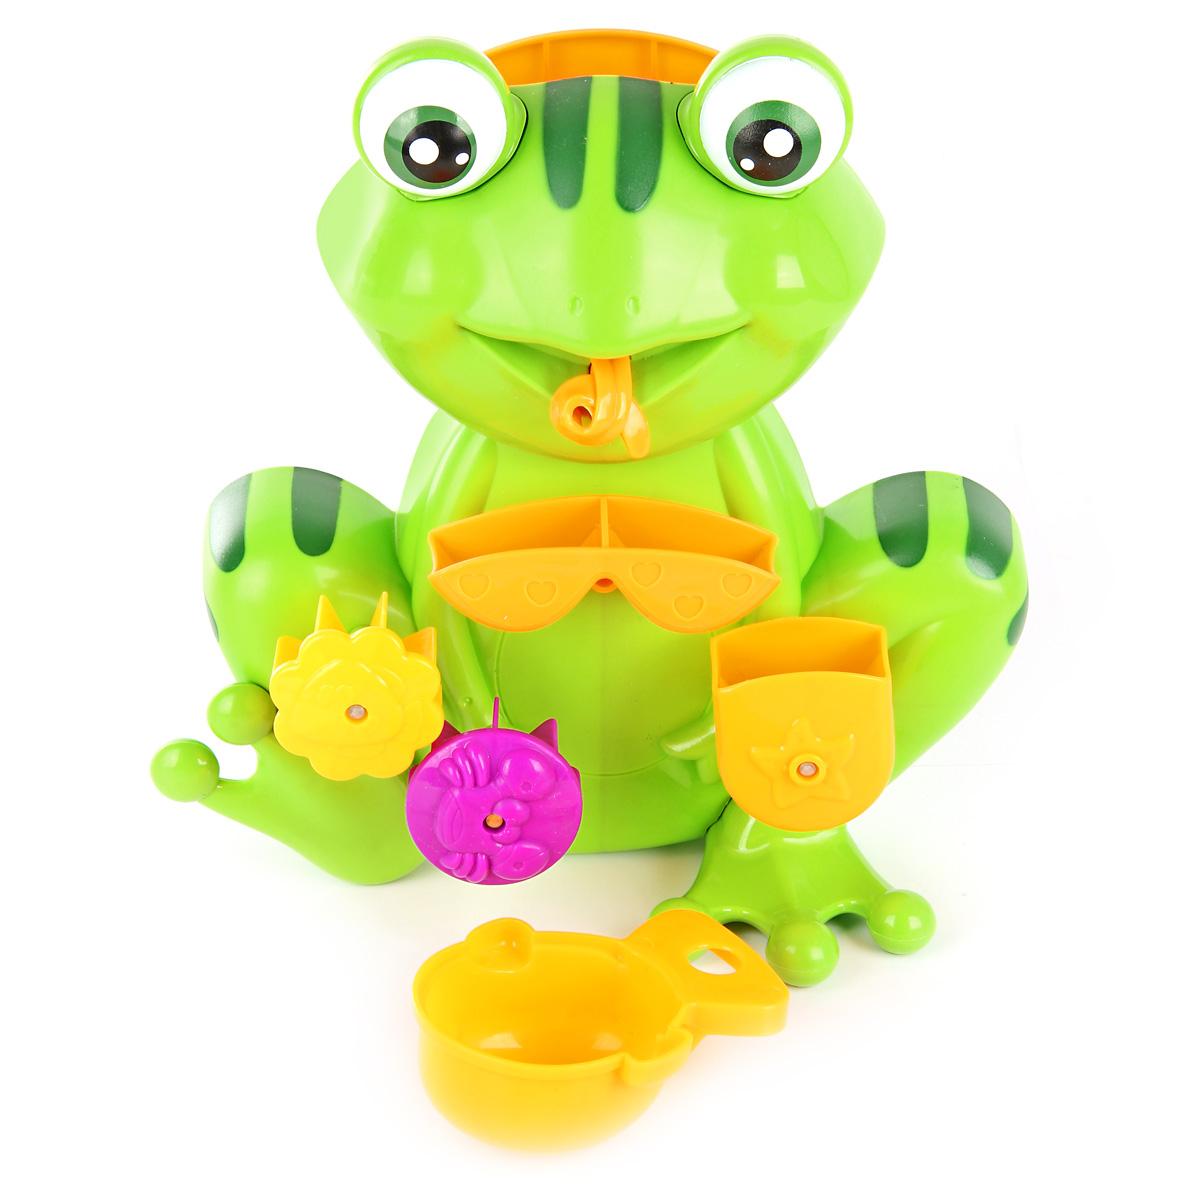 Игрушки для ванны Ути Пути Мельница. Лягушка